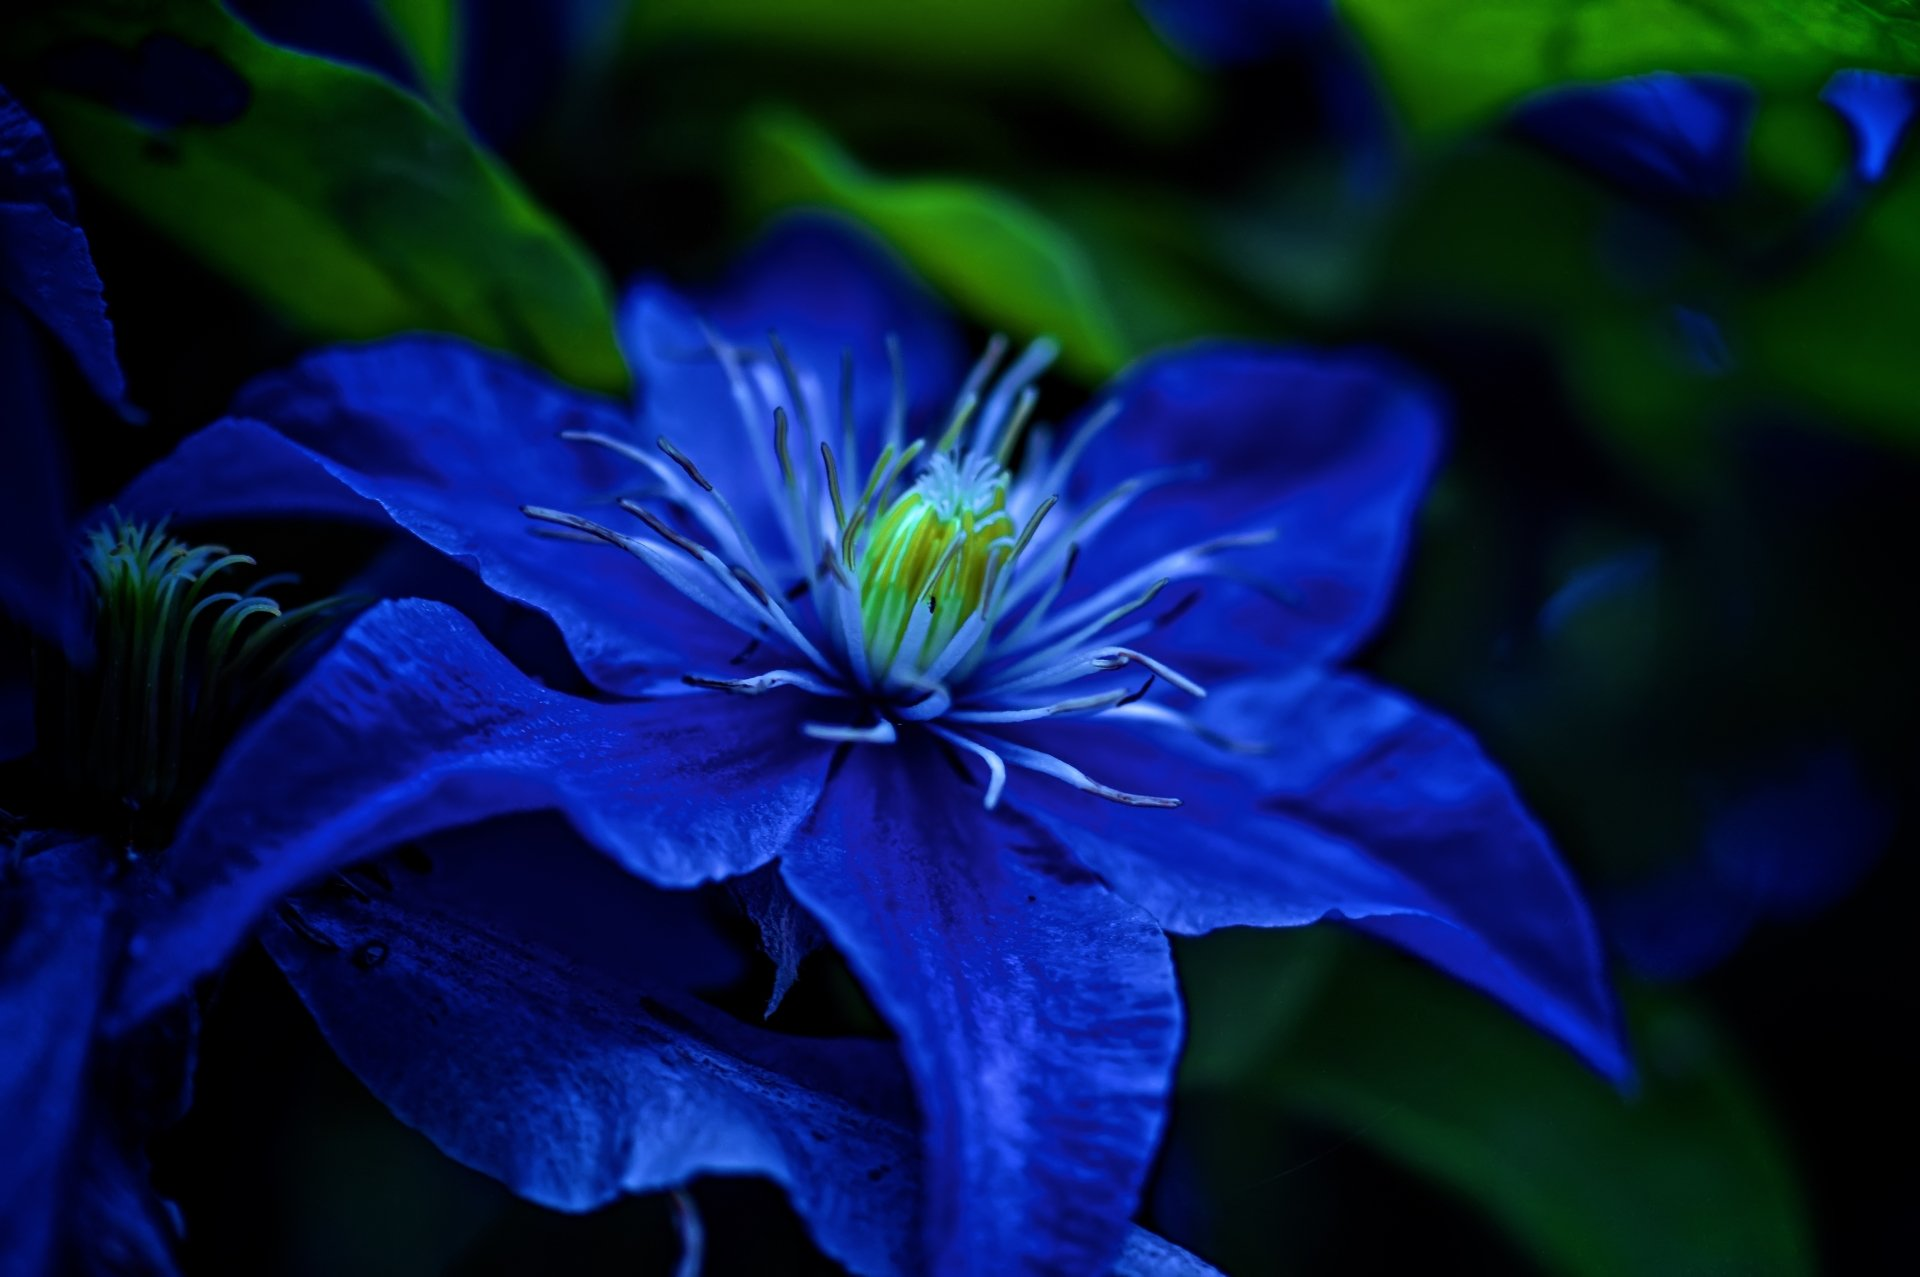 Blue Flower 5k Retina Ultra HD Wallpaper | Background ...